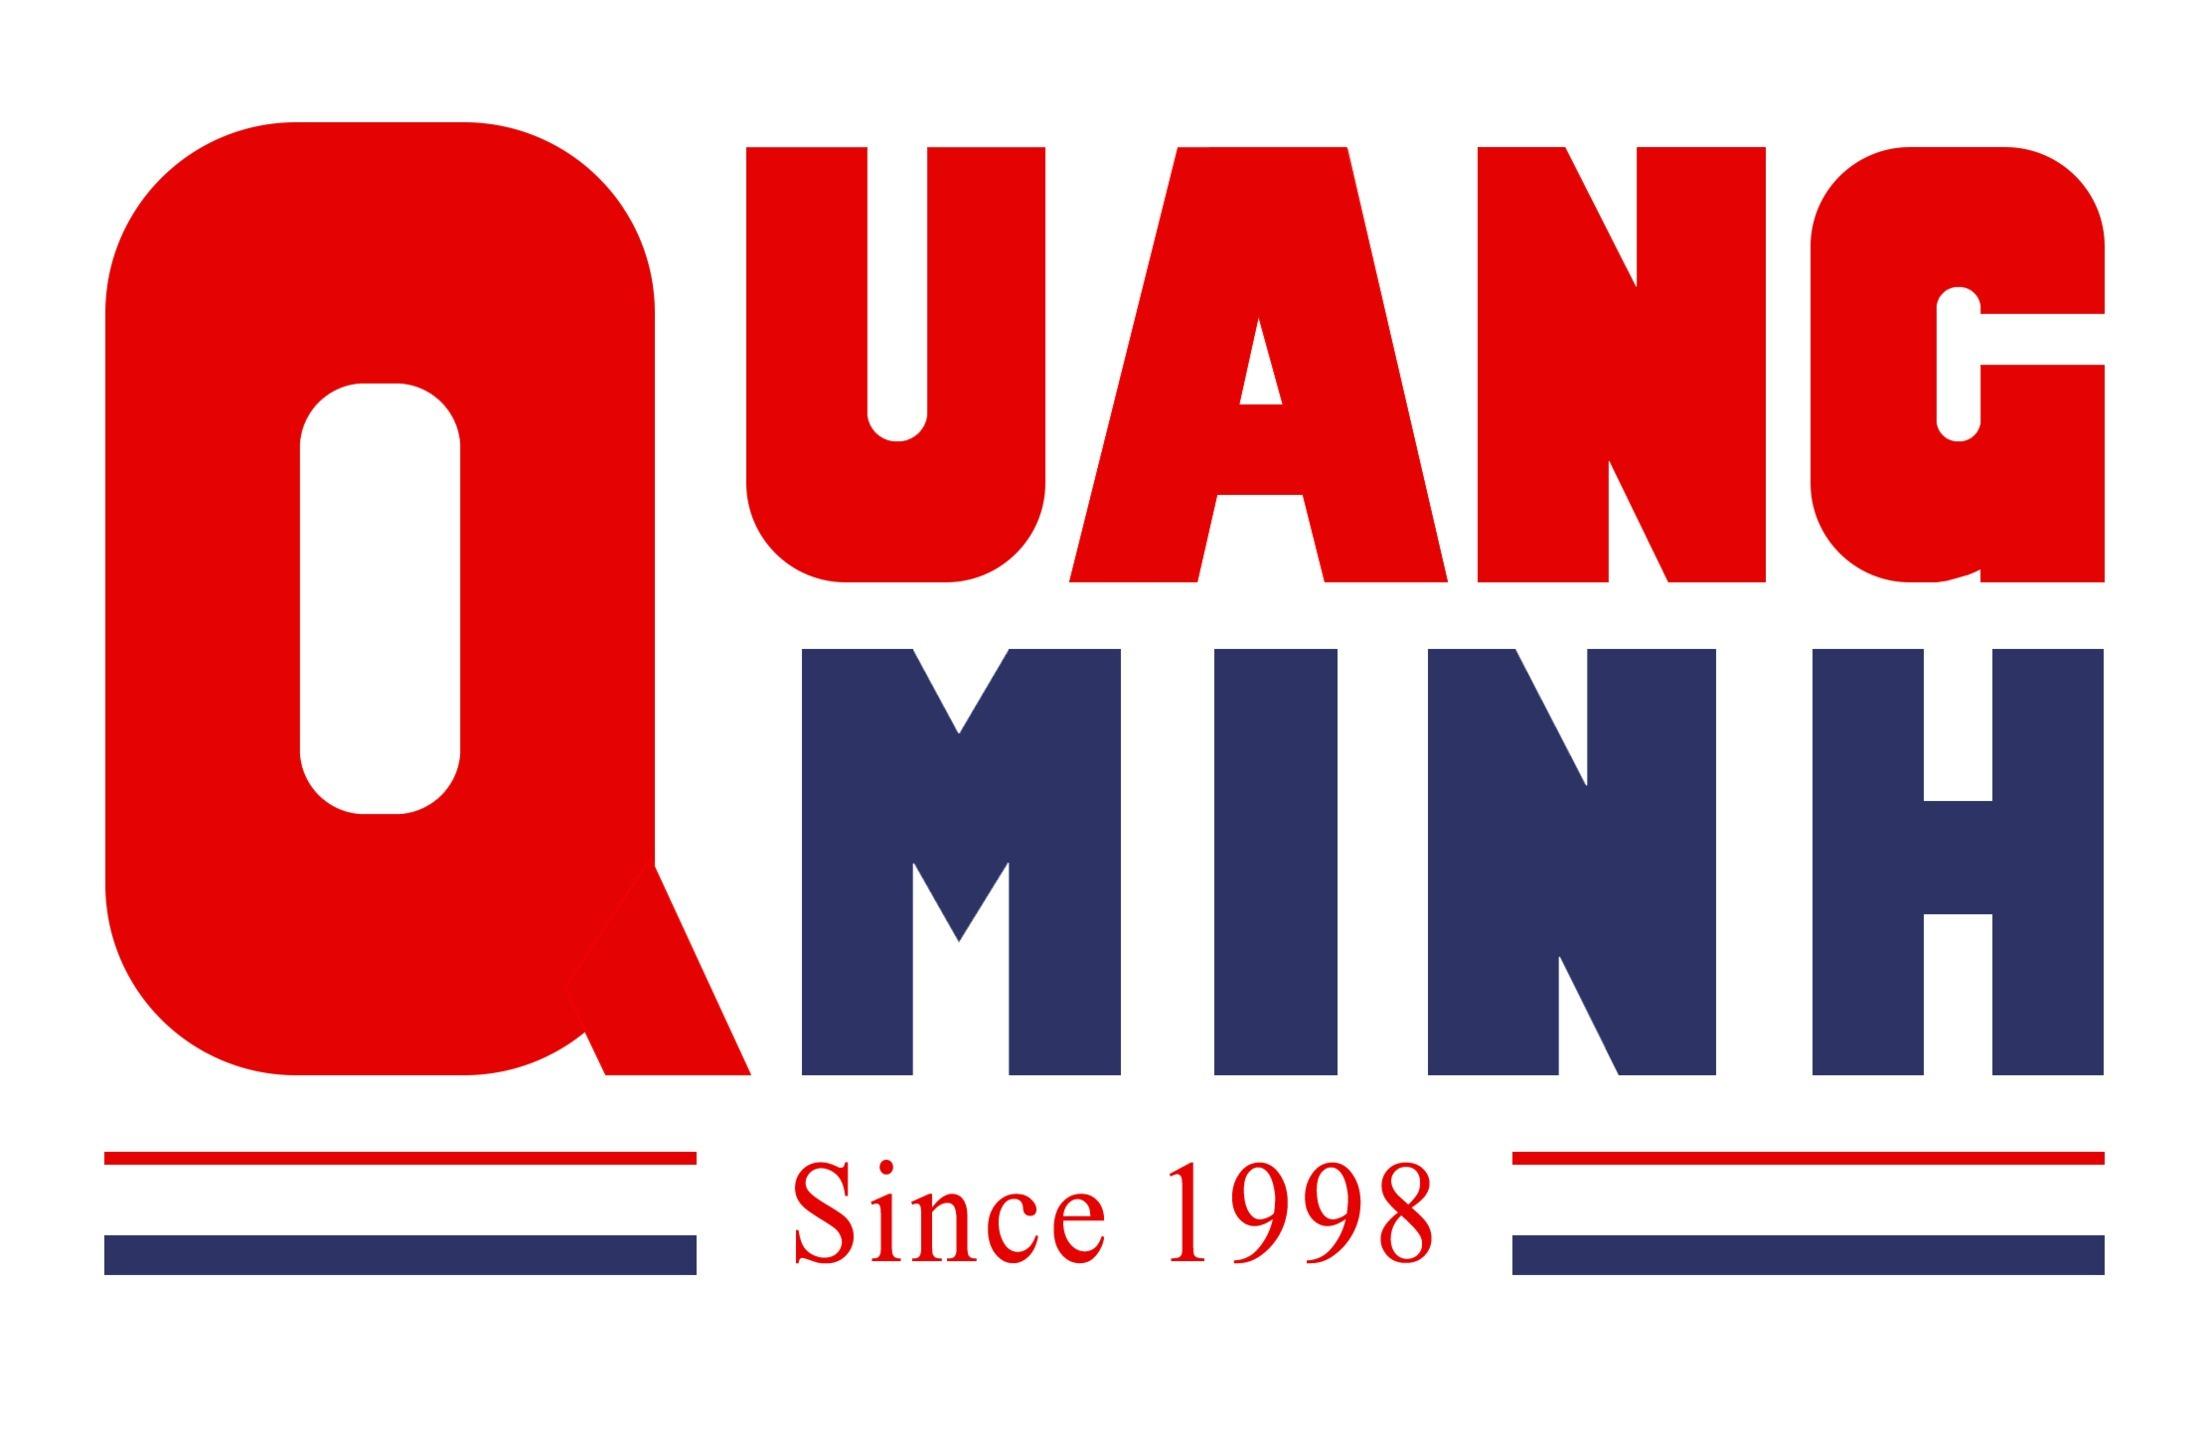 cualuoichongmuoiquan12 (@cualuoichongmuoiquan12) Cover Image